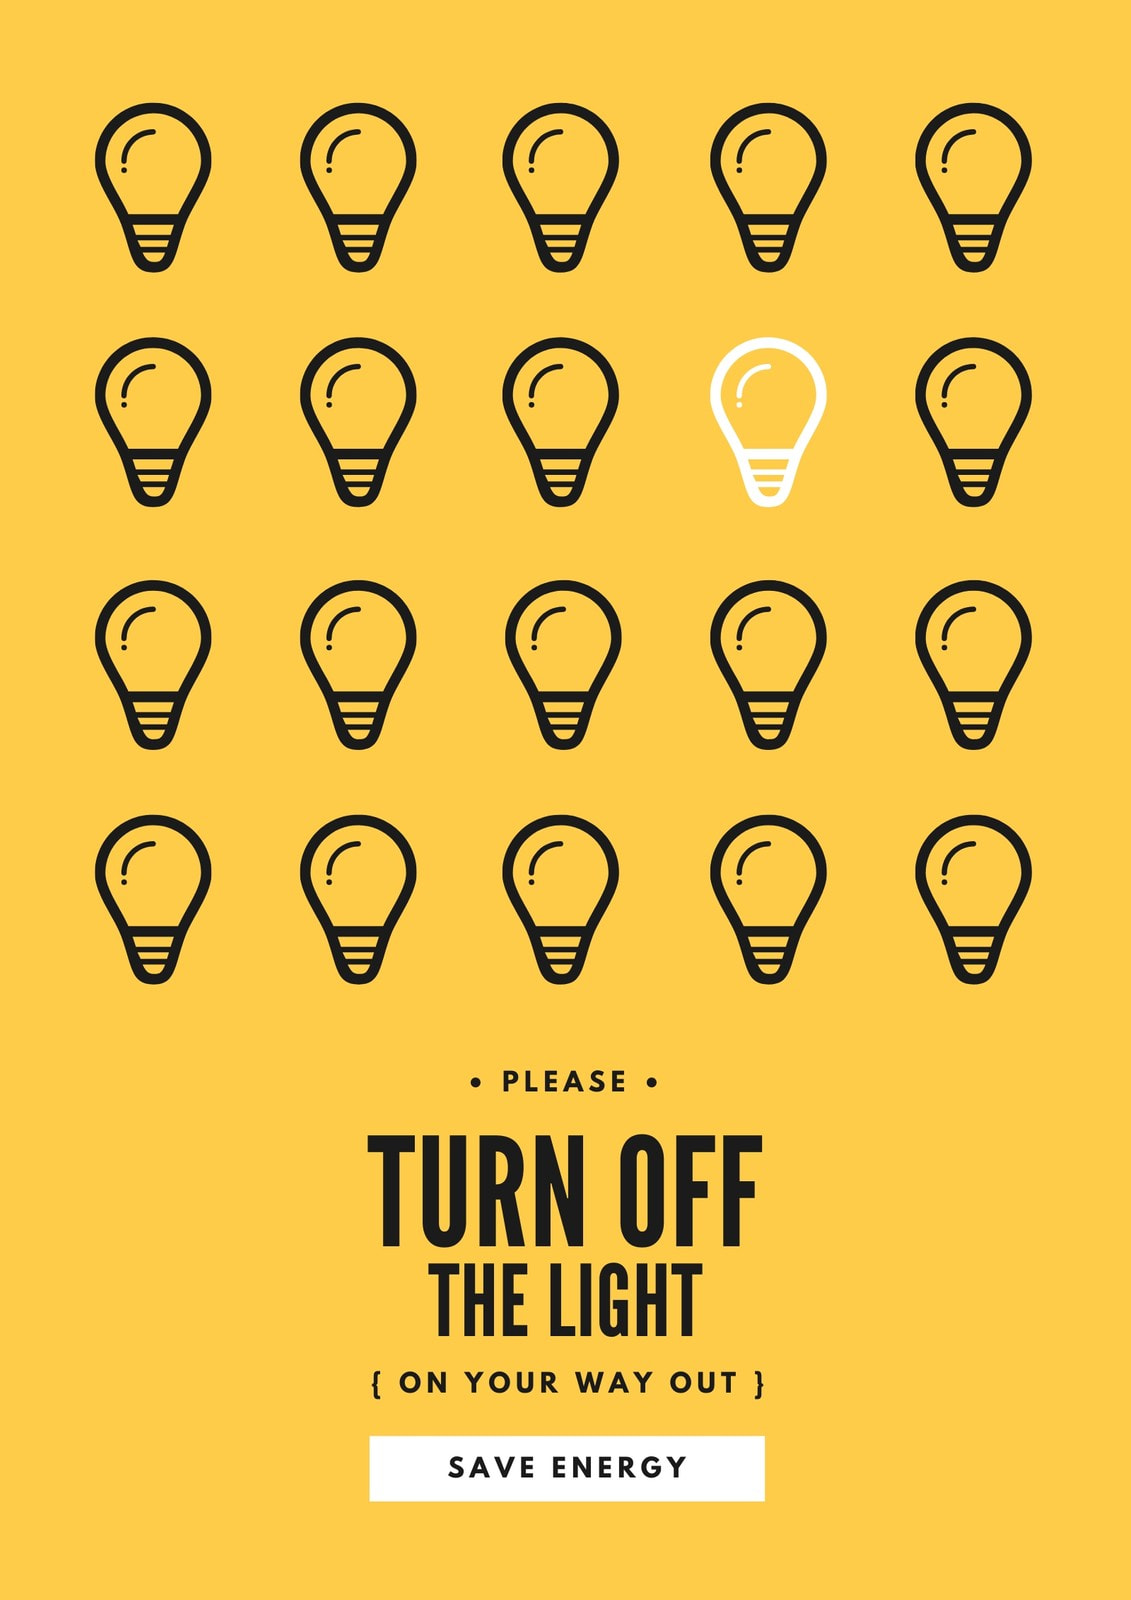 Lightbulbs Save Energy Campaign Poster